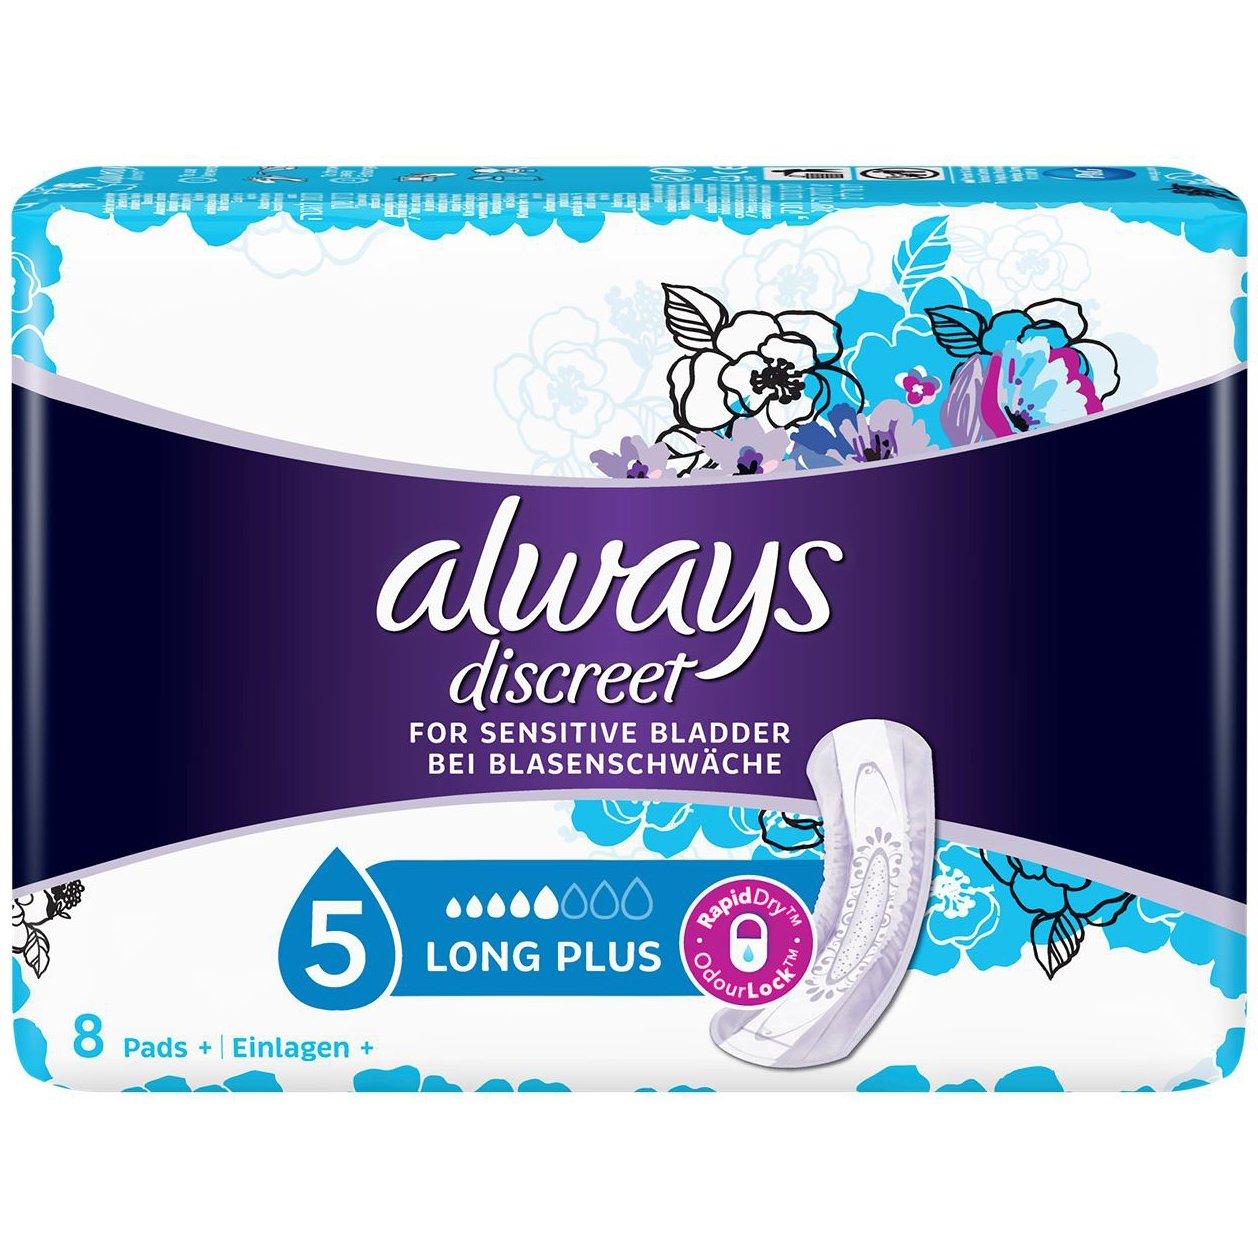 Always Discreet for Sensitive Bladder Long Plus Pads Σερβιέτες Ακράτειας για Πολύ Μεγάλη Ένταση 8 Τεμάχια